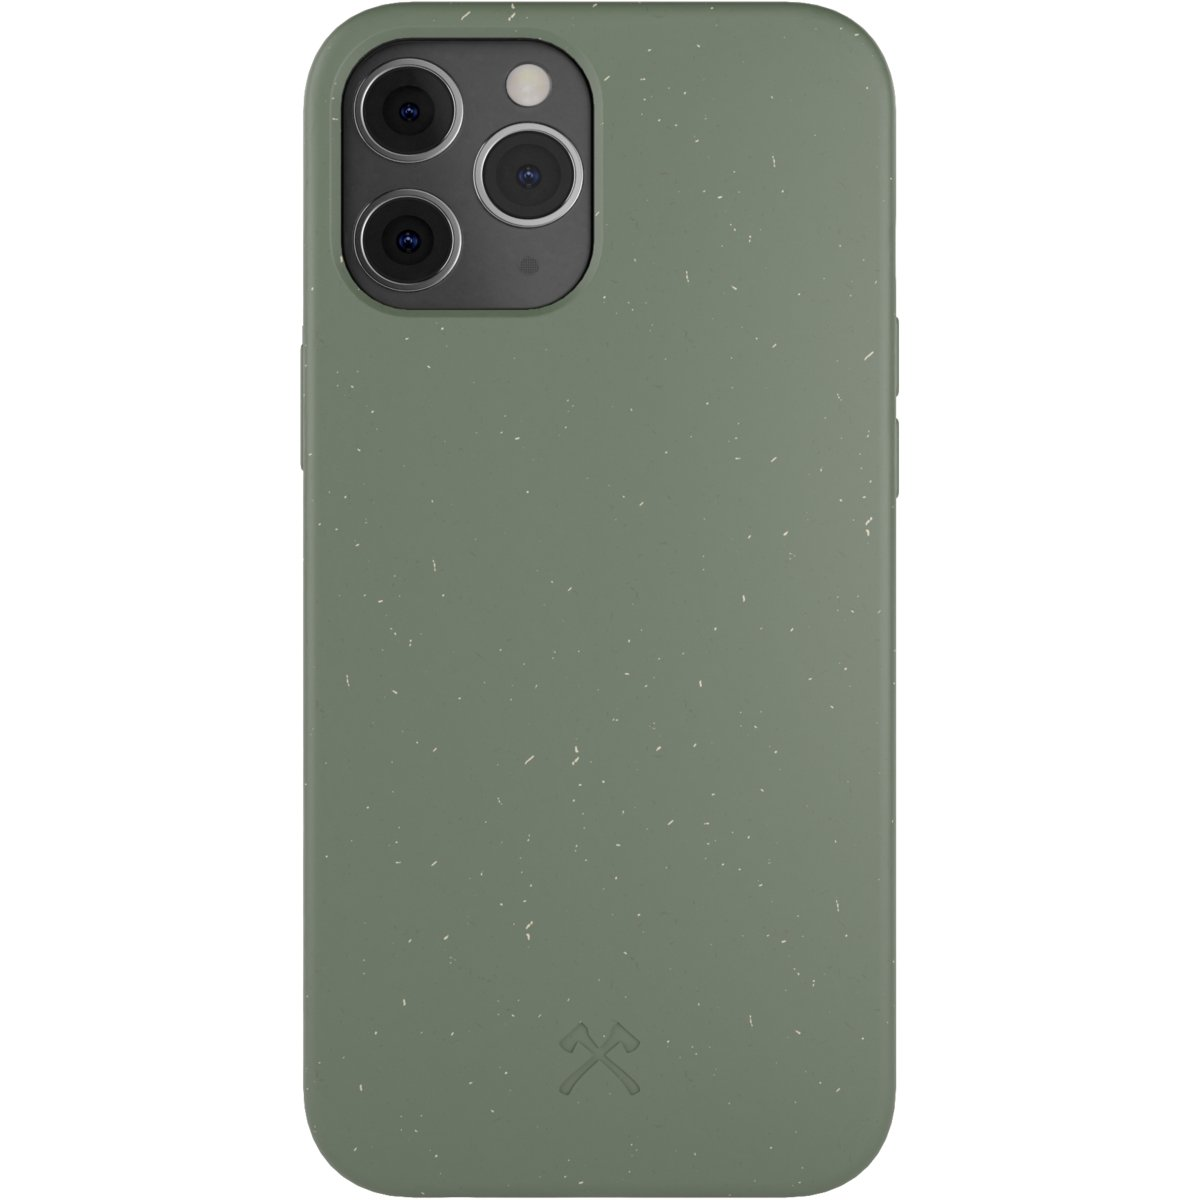 Woodcessories Bio Case AM iPhone 12 / 12 Pro - green